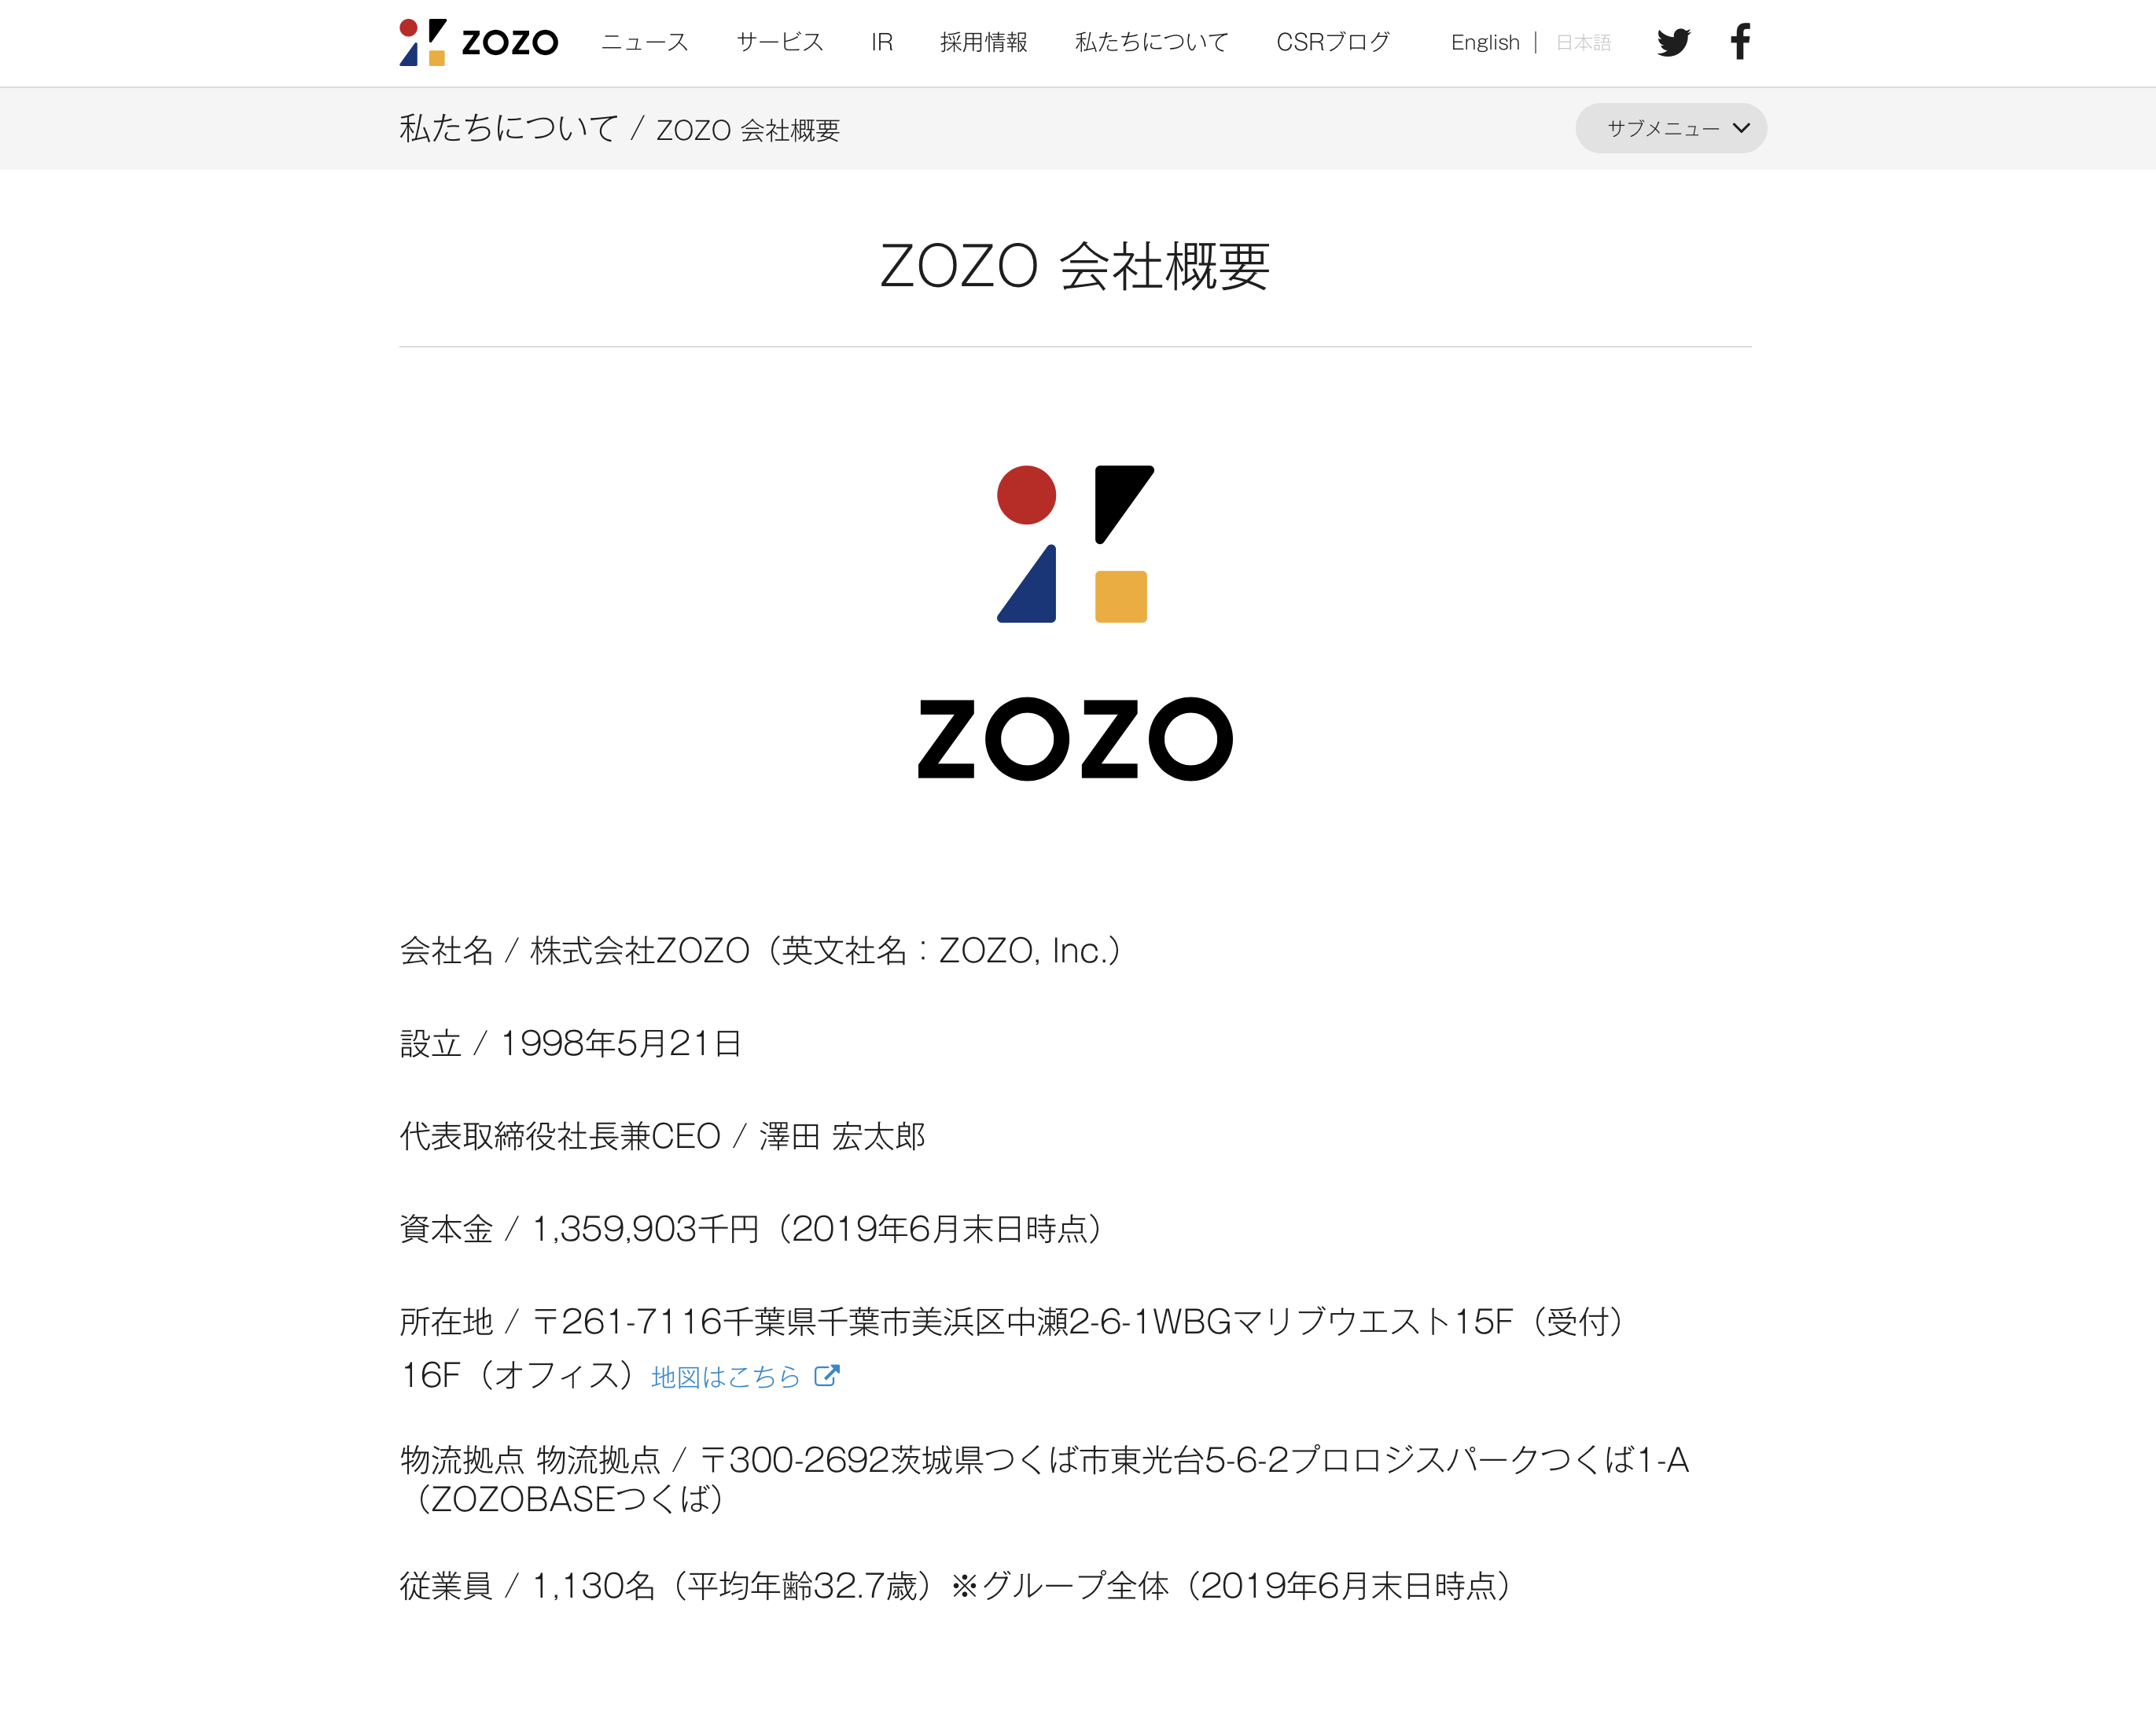 ZOZOTOWNがYahoo!の傘下に、前澤友作氏は退任へ!